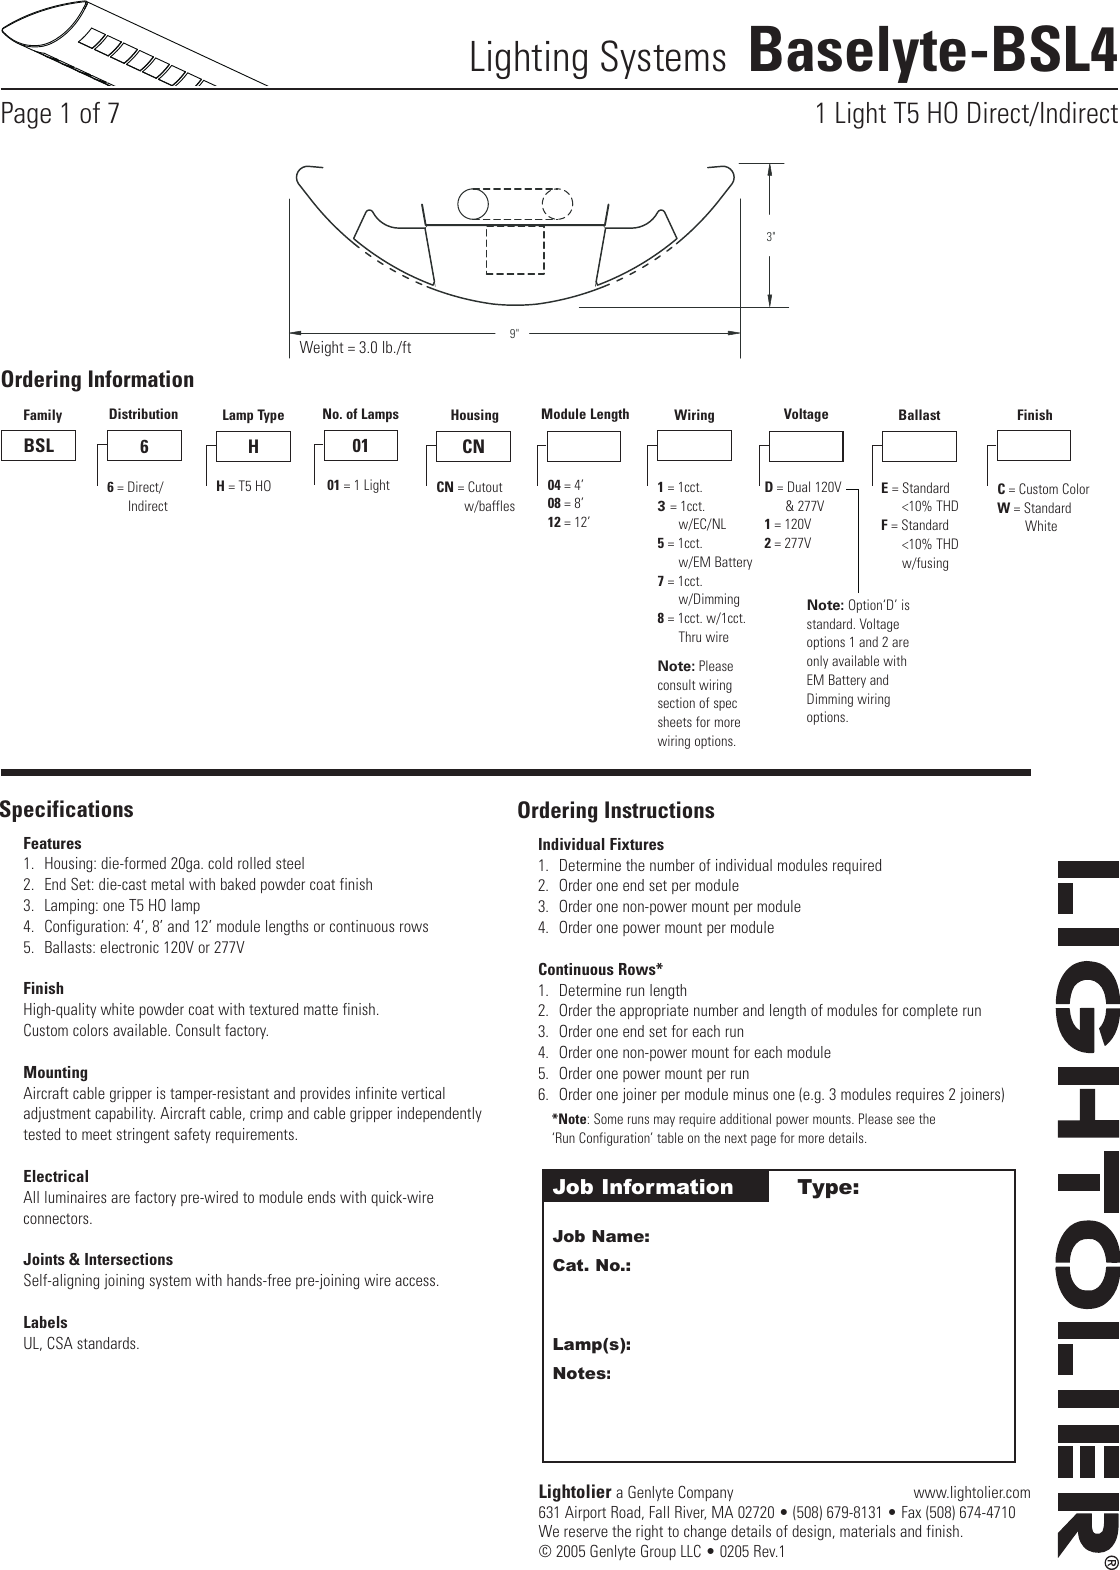 LightolierBaselyteBsl4UsersManual572149.224450269 User Guide Page 1 lightolier baselyte bsl4 users manual